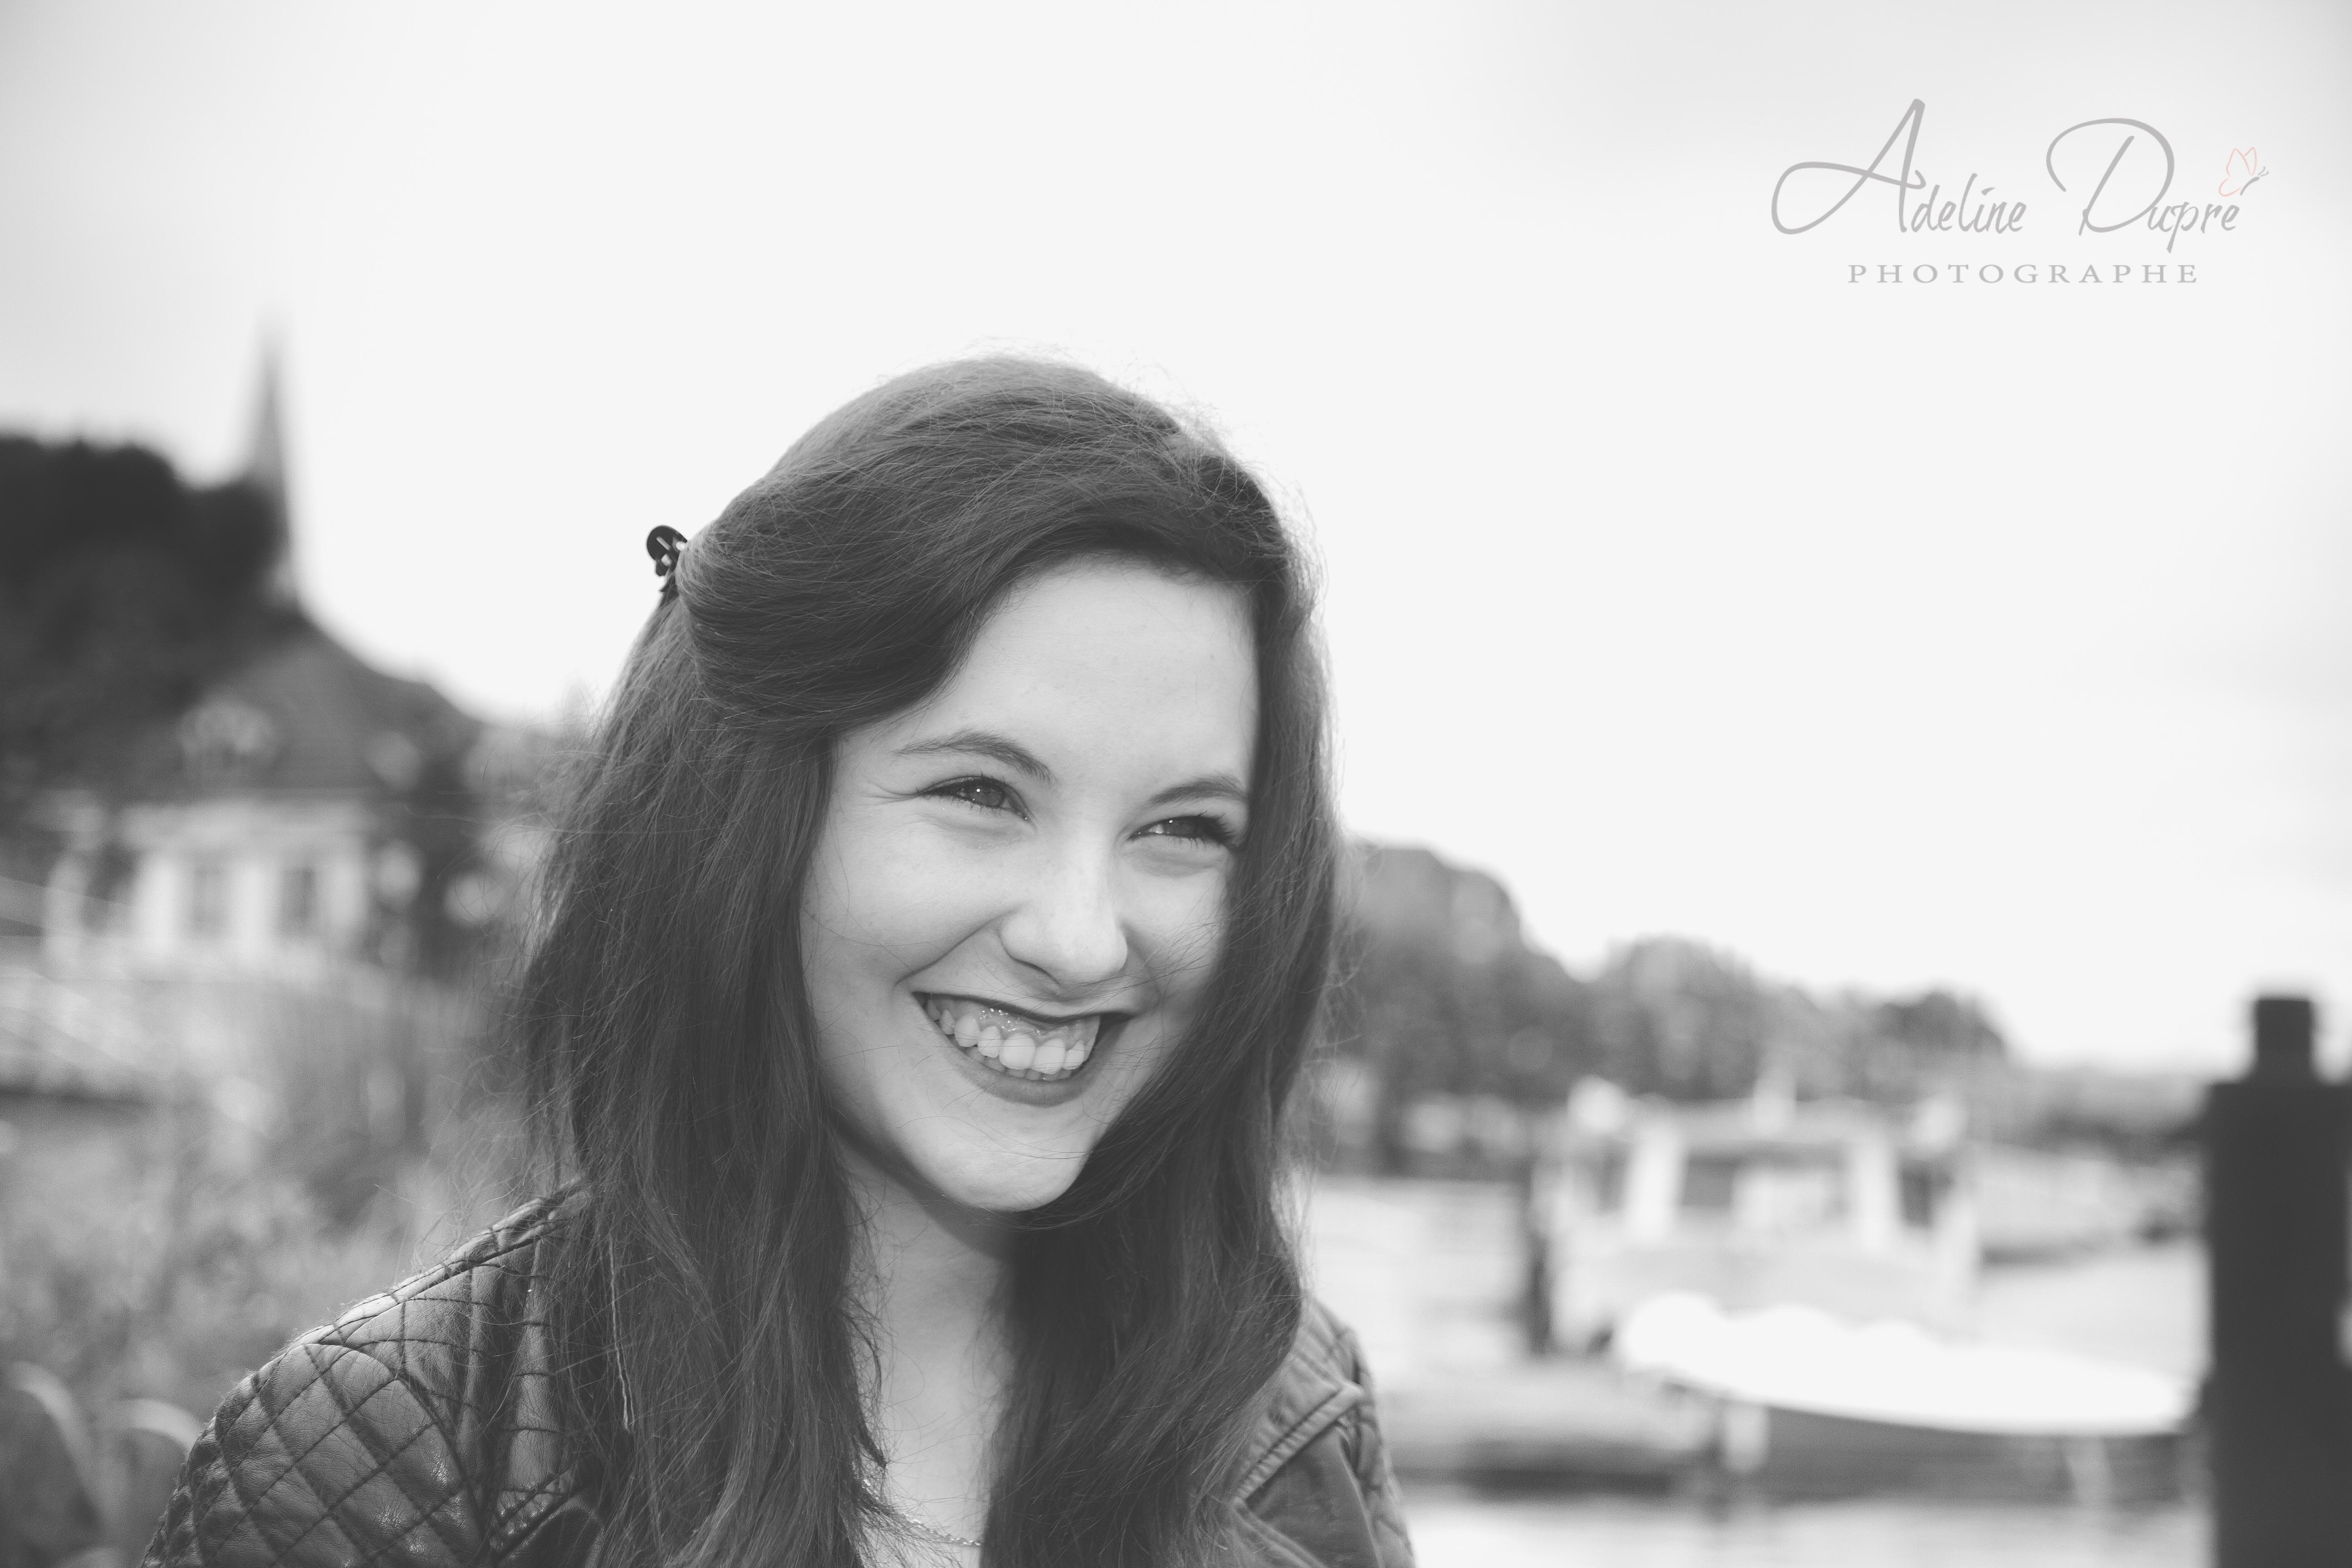 Adeline_Dupré_photographe_Yonne-3190